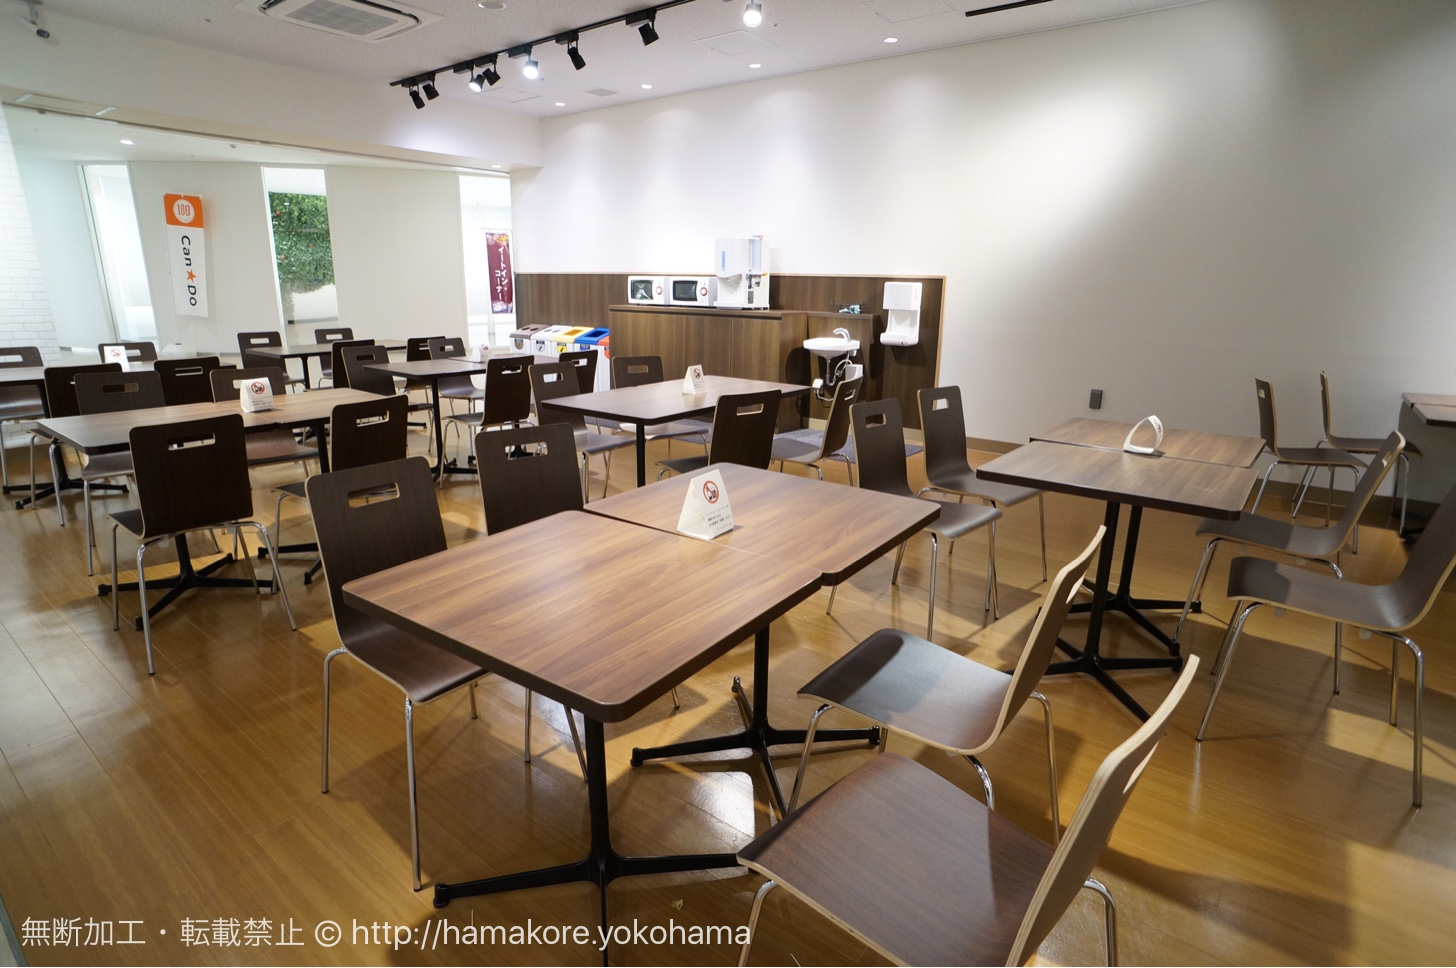 OK みなとみらい店のフードコートが2月10日オープン!OK直営焼肉店「和」やオーケー食堂「旬」